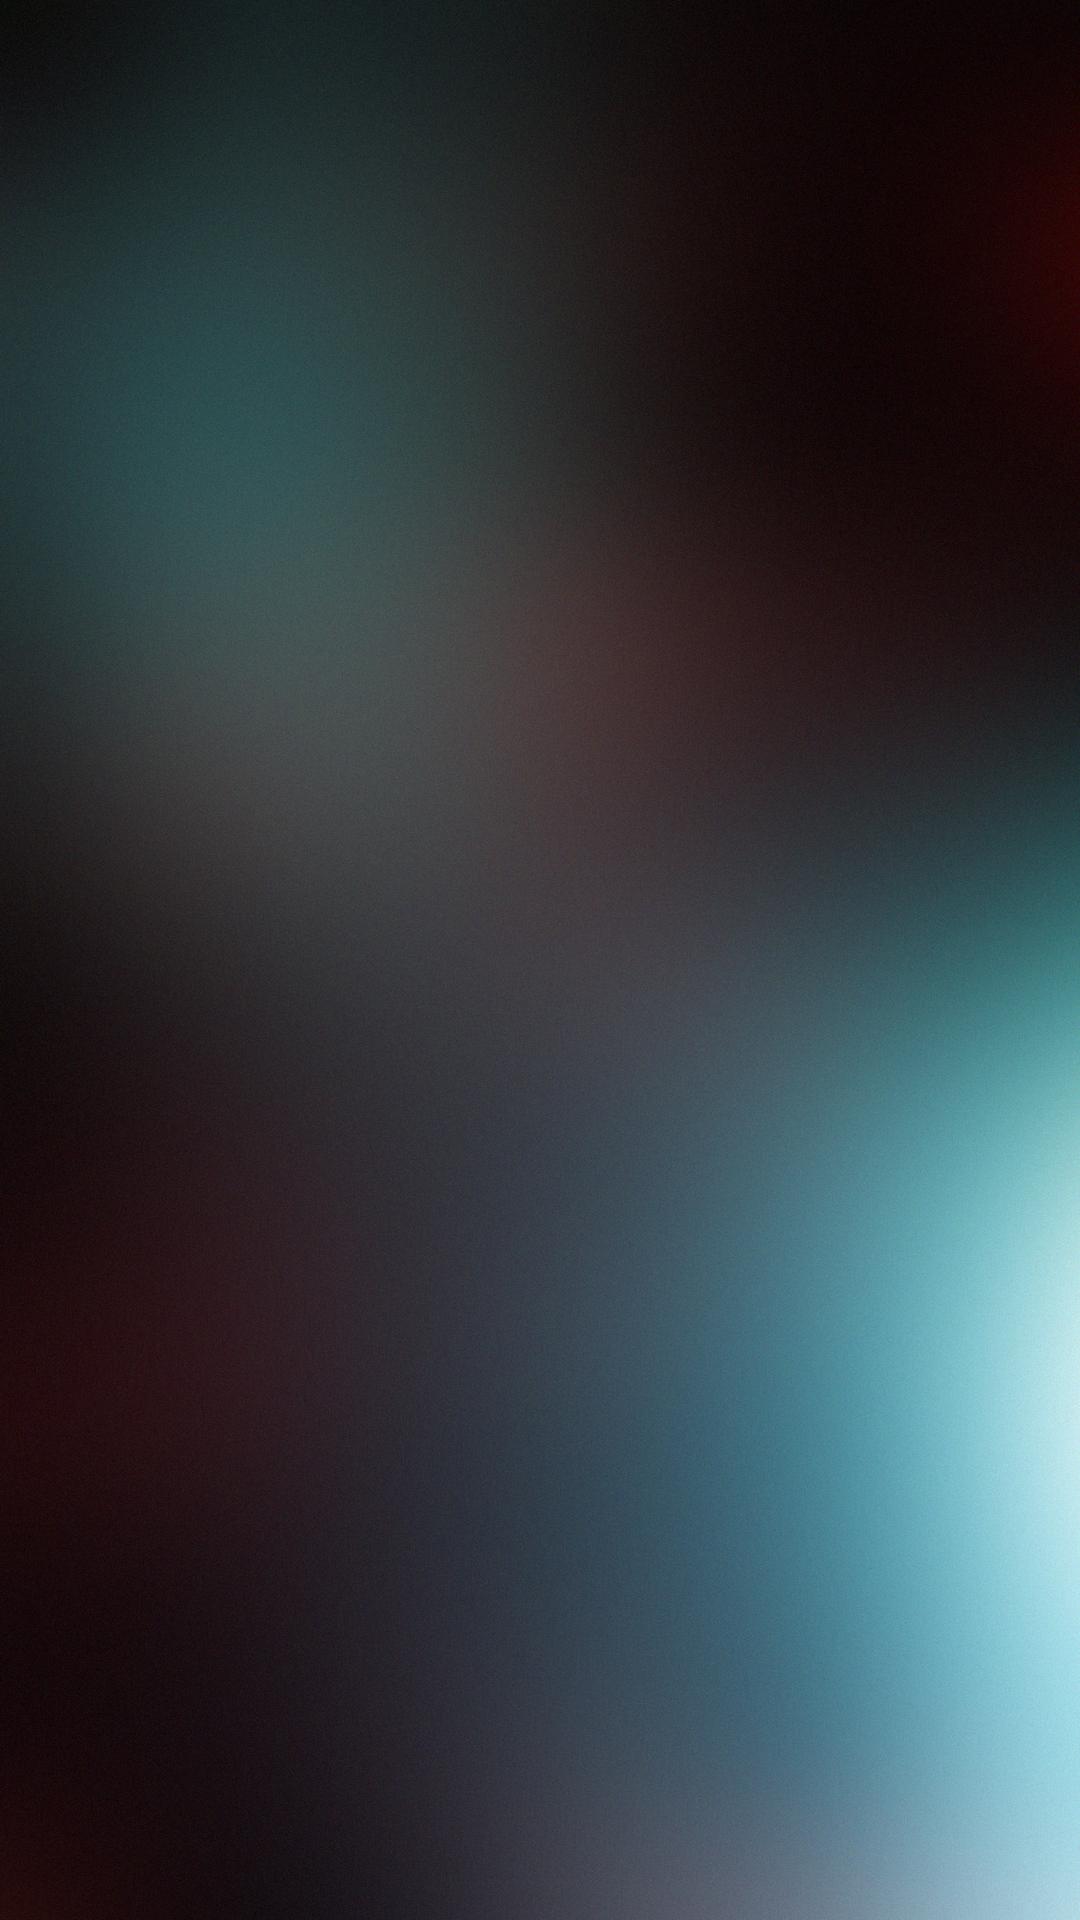 Abstract Iphone Wallpaper Wallpapersafari